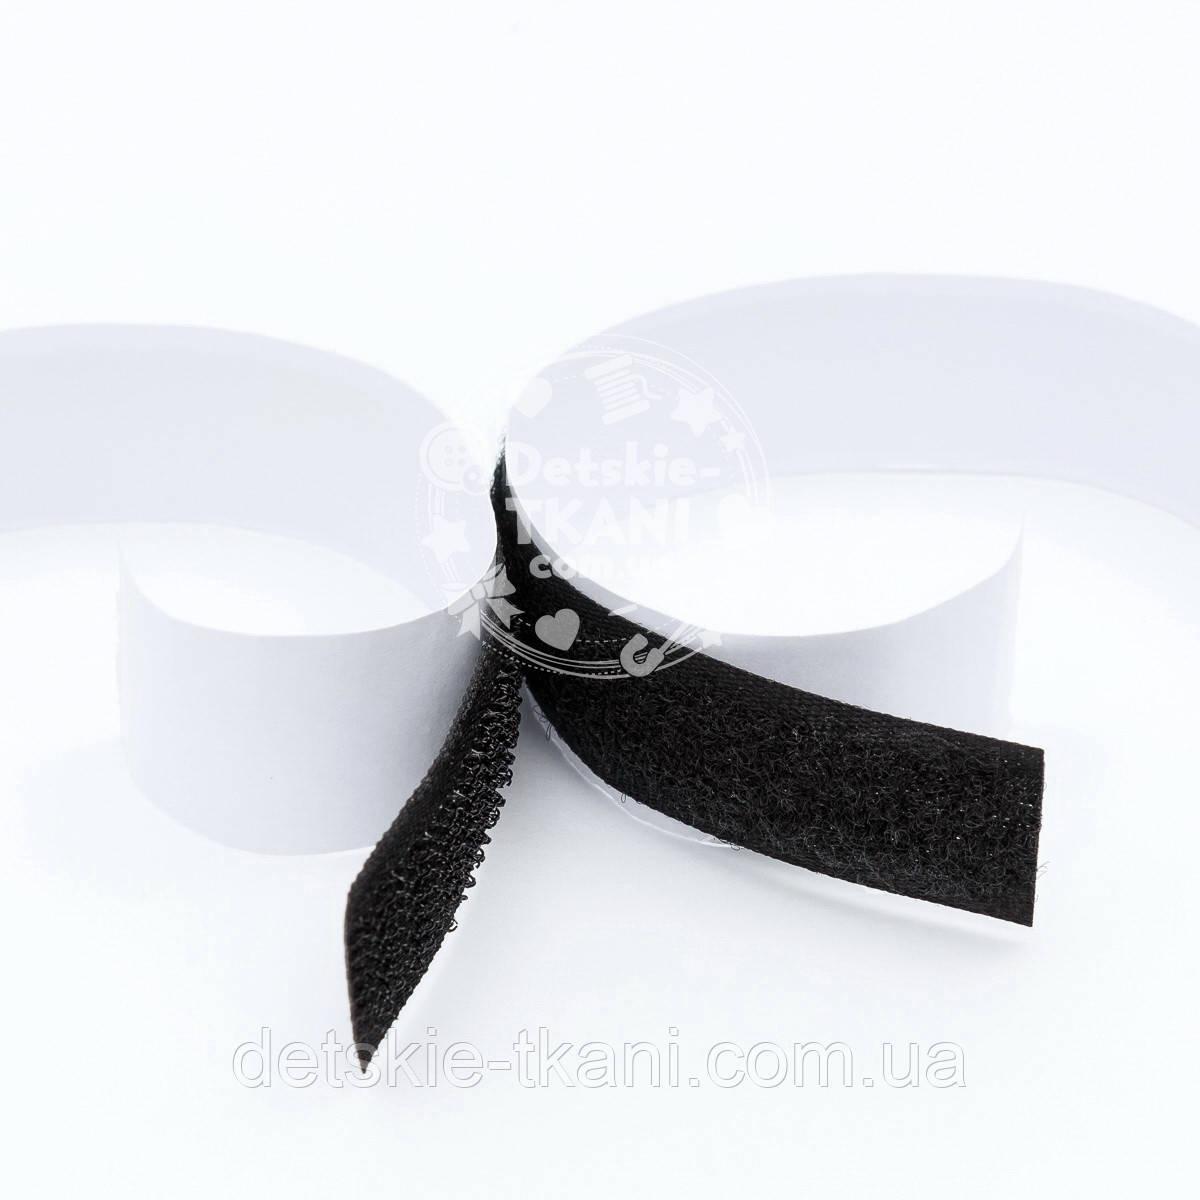 Липучка чорна з клейовою стороною, ширина 16 мм, метражем